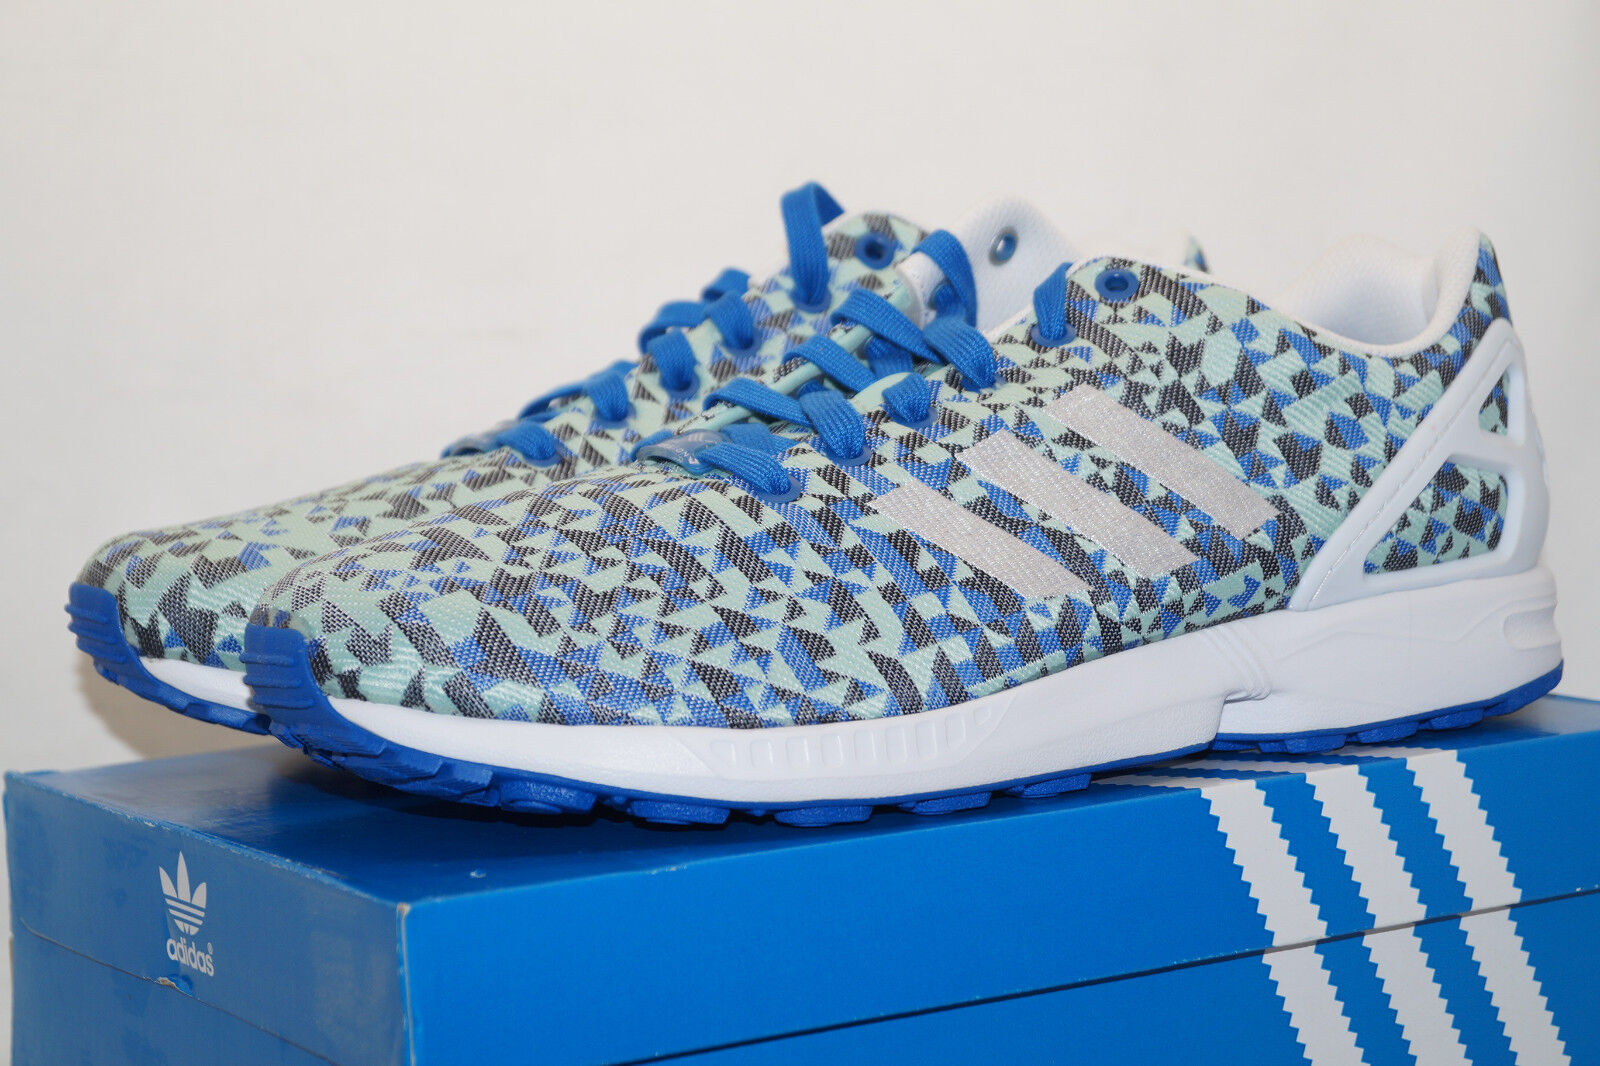 Adidas originals ZX FLUX TORSION WEAVE EU 46.6 UK11.5 blau hellgrün B34474 Angenehmes Aussehen